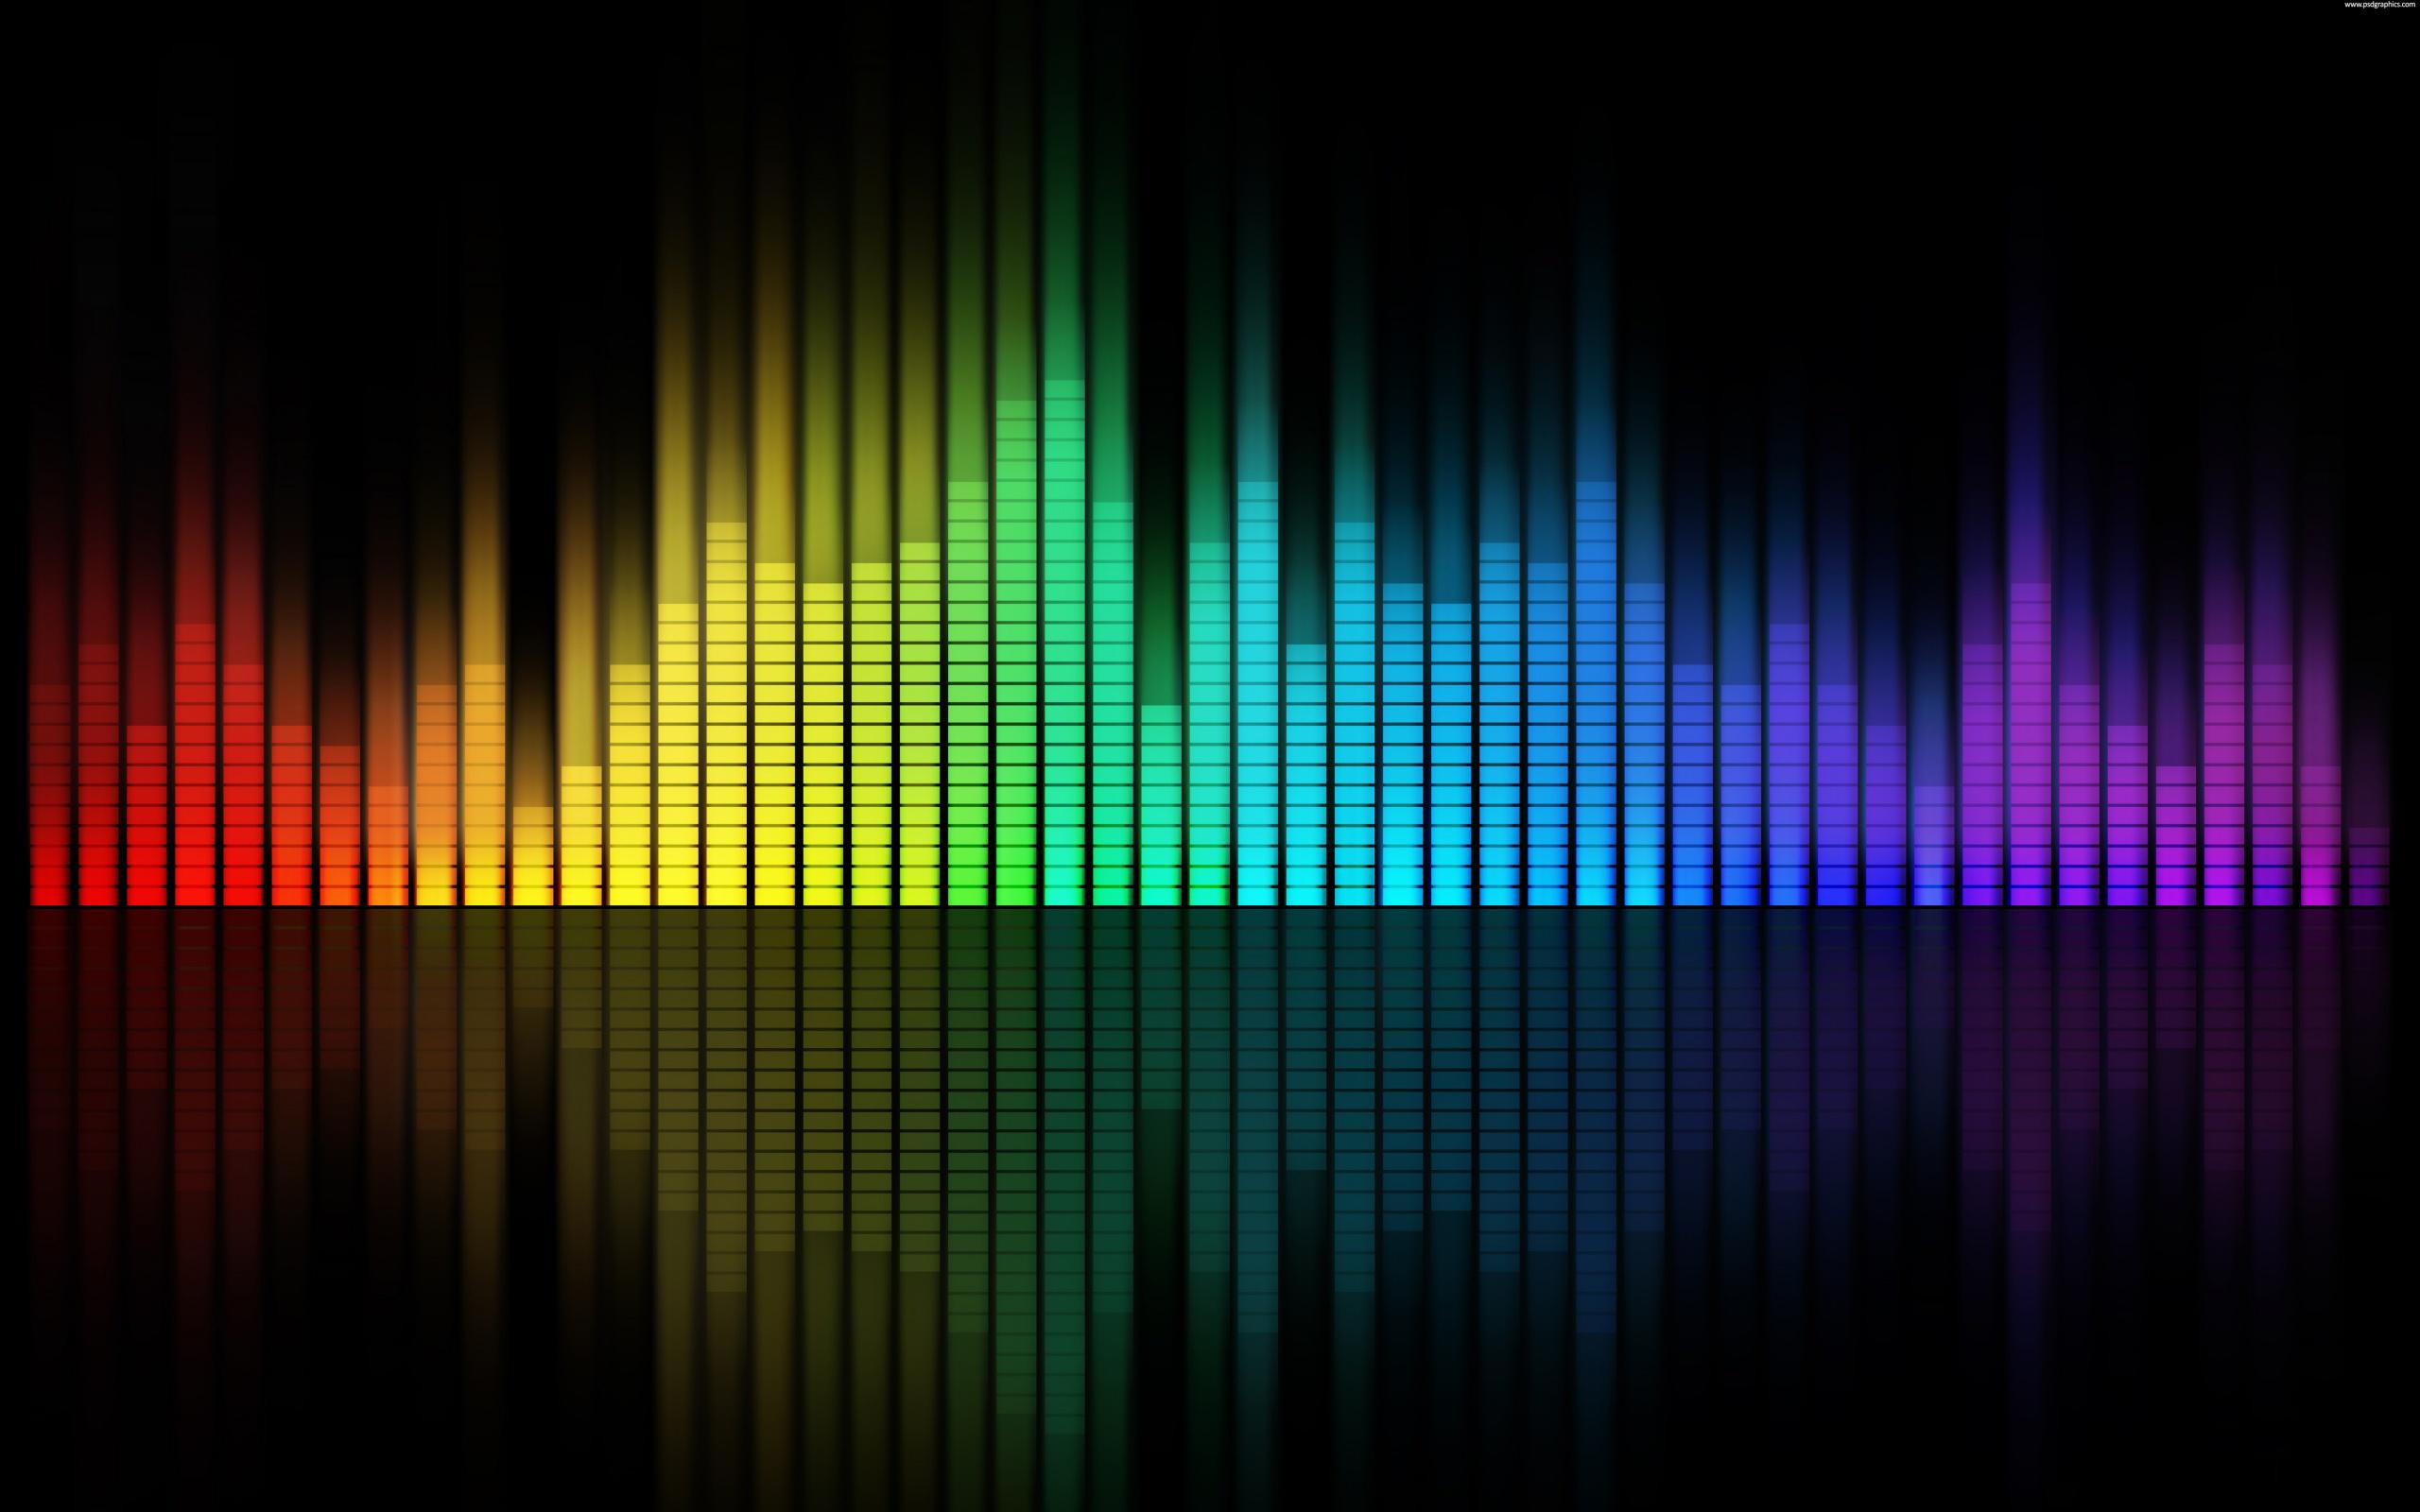 Music Desktop Backgrounds 2560x1600